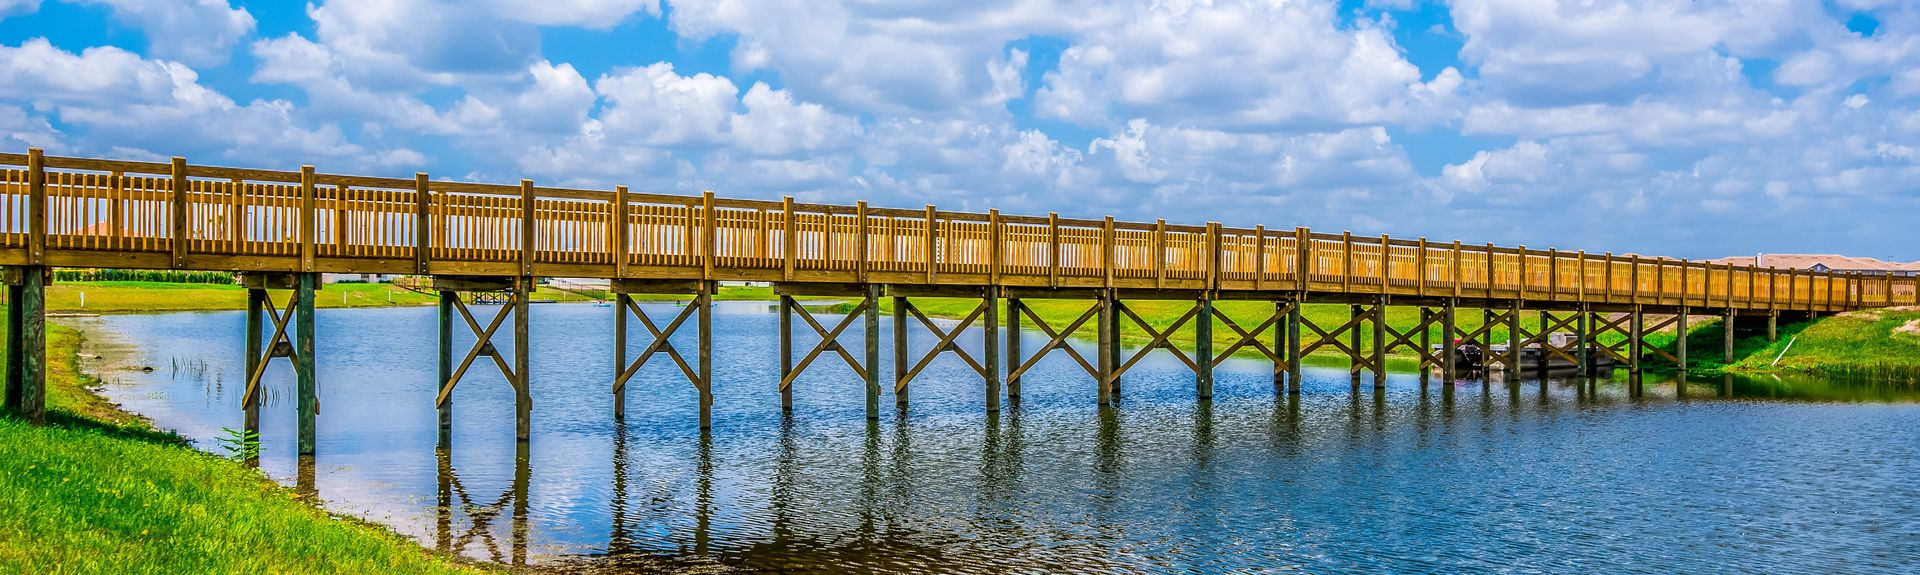 Chatham Park, Kissimmee, Florida, Estados Unidos